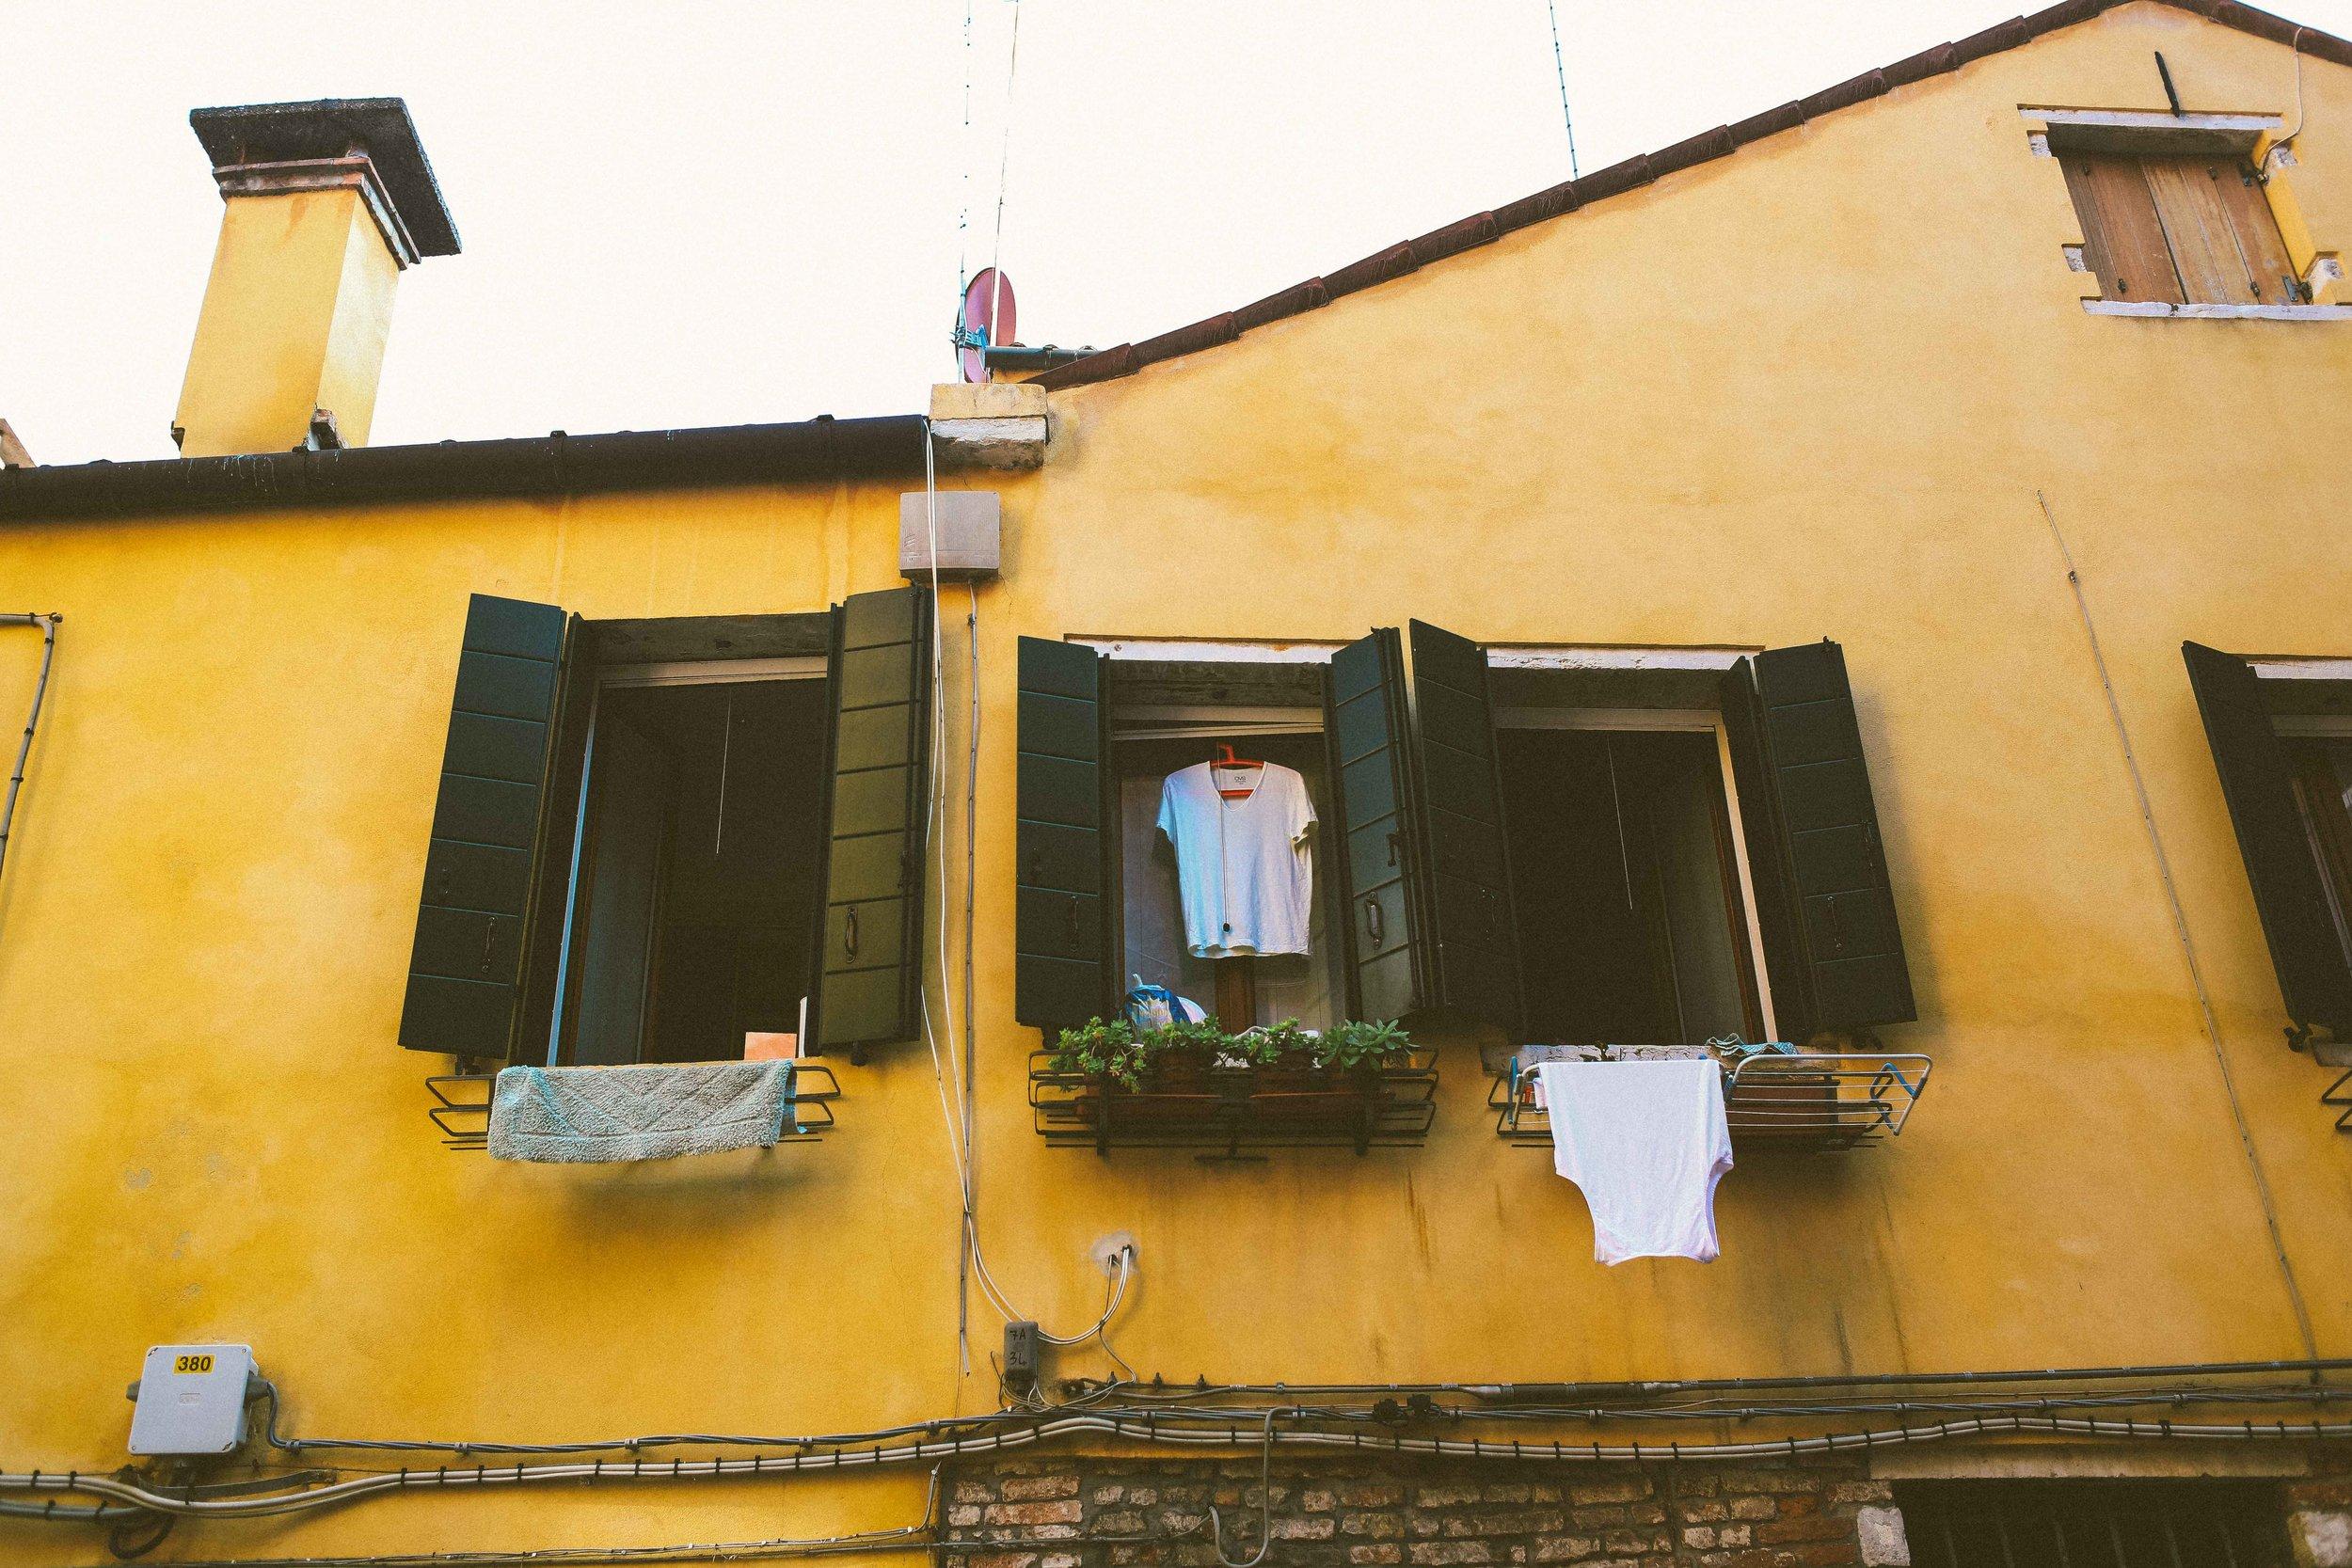 Portrait_Photographer_Venice_Italy.jpg